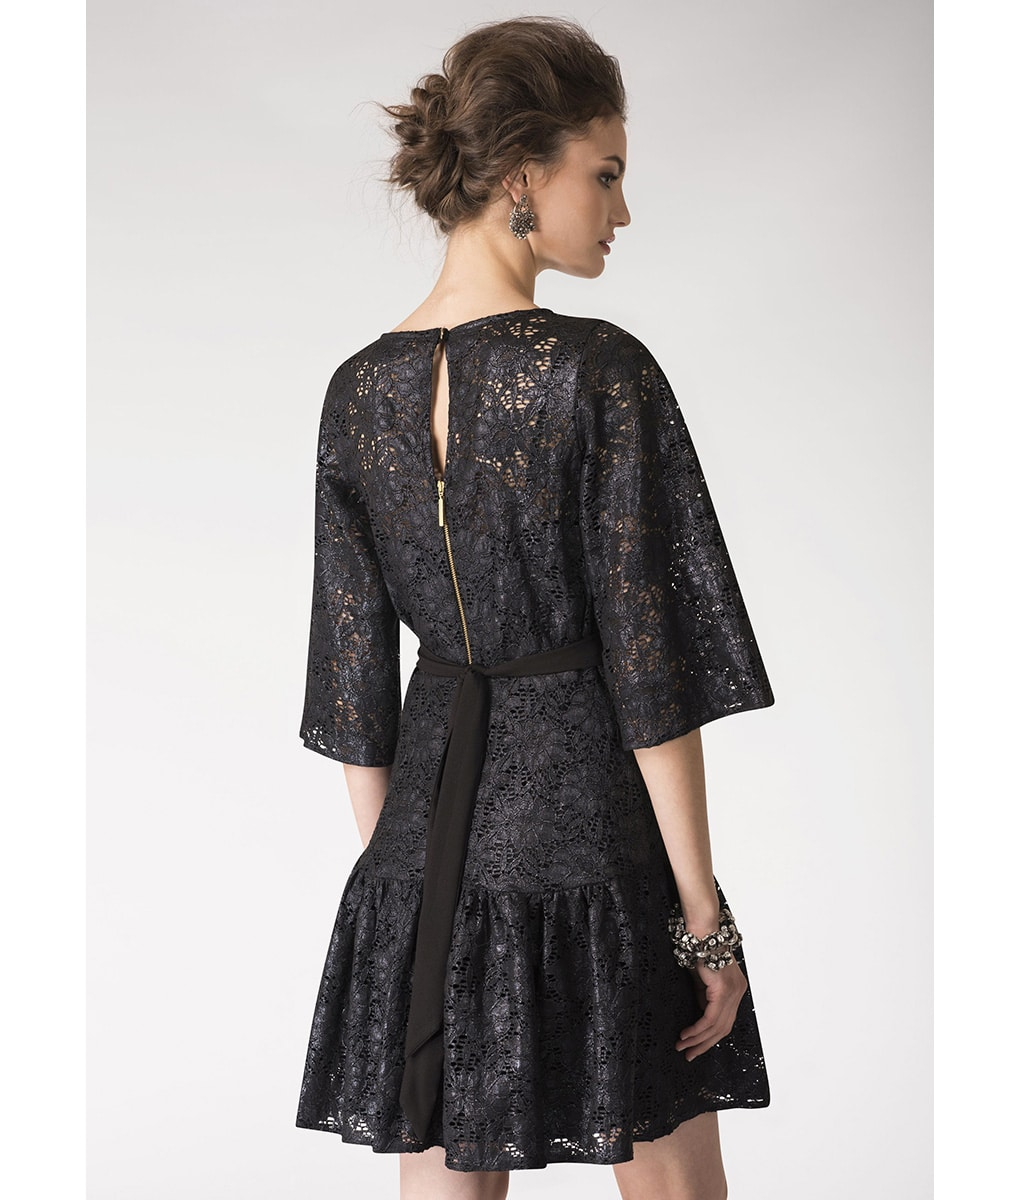 Alila-Metallix-Lace-Black-Dress-Closet-London